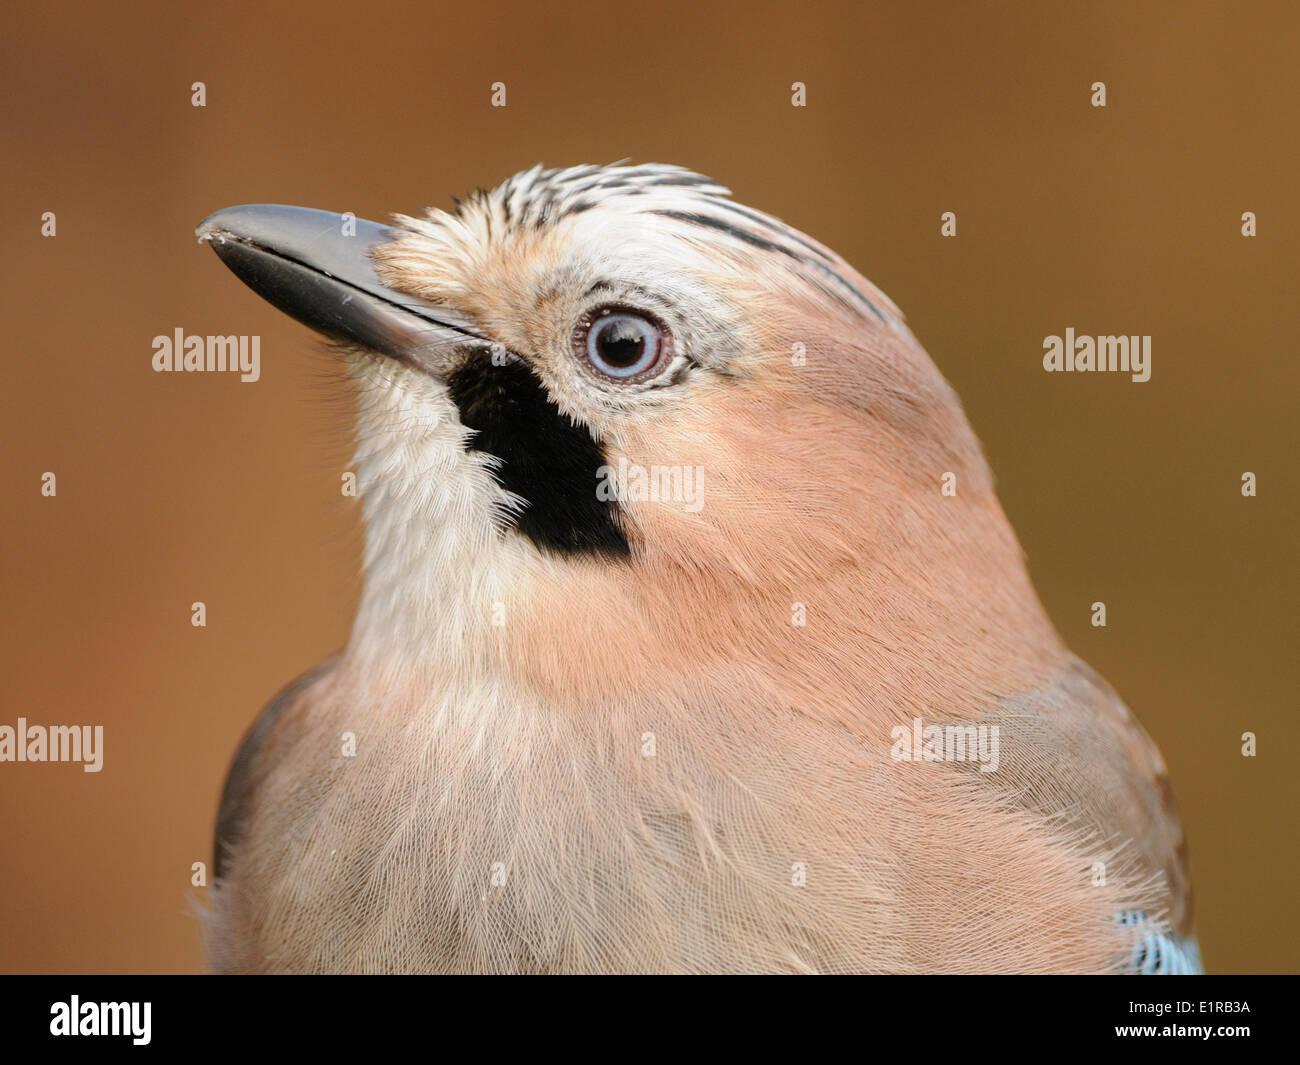 Headshot of a Jay - Stock Image